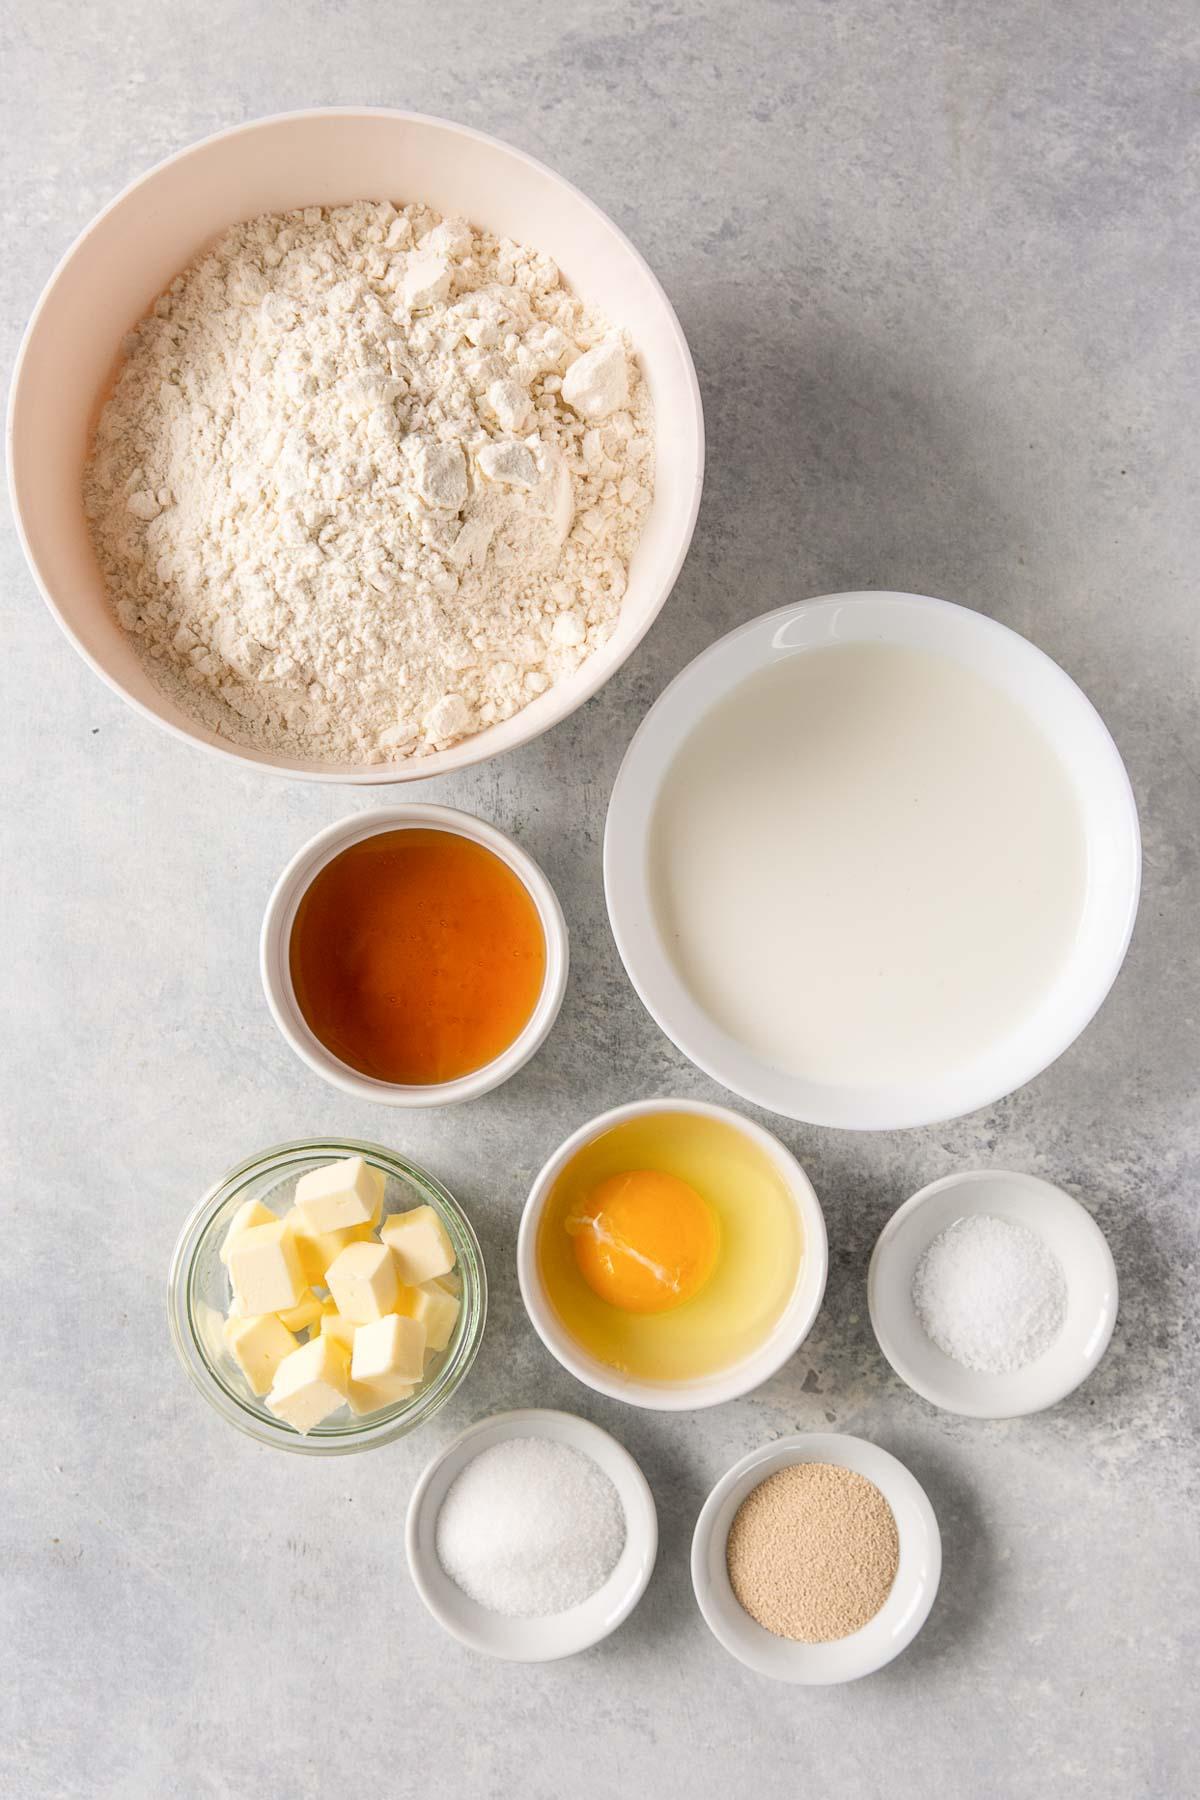 ingredients for honey yeast rolls